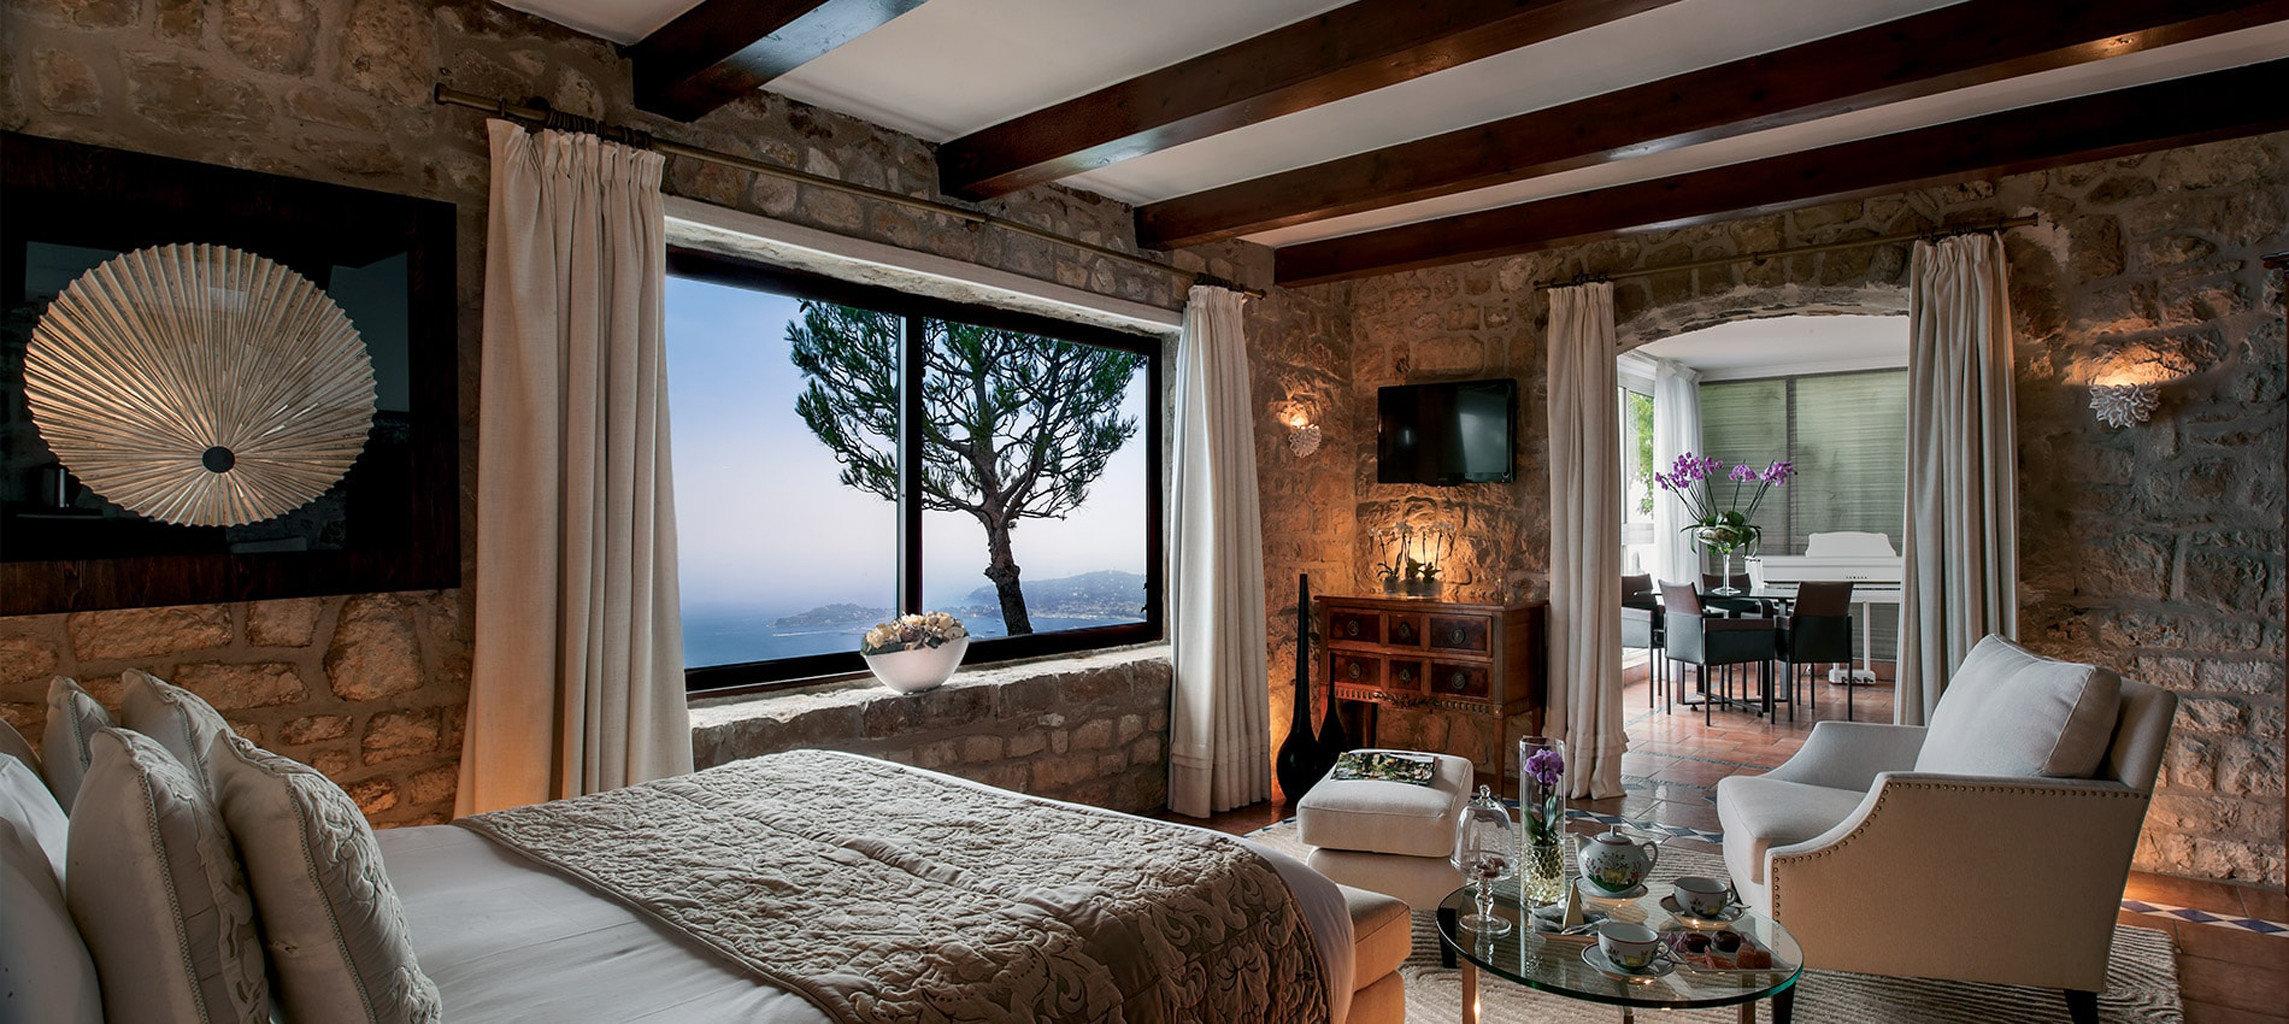 property living room house home Villa cottage mansion farmhouse porch Resort Bedroom Suite stone